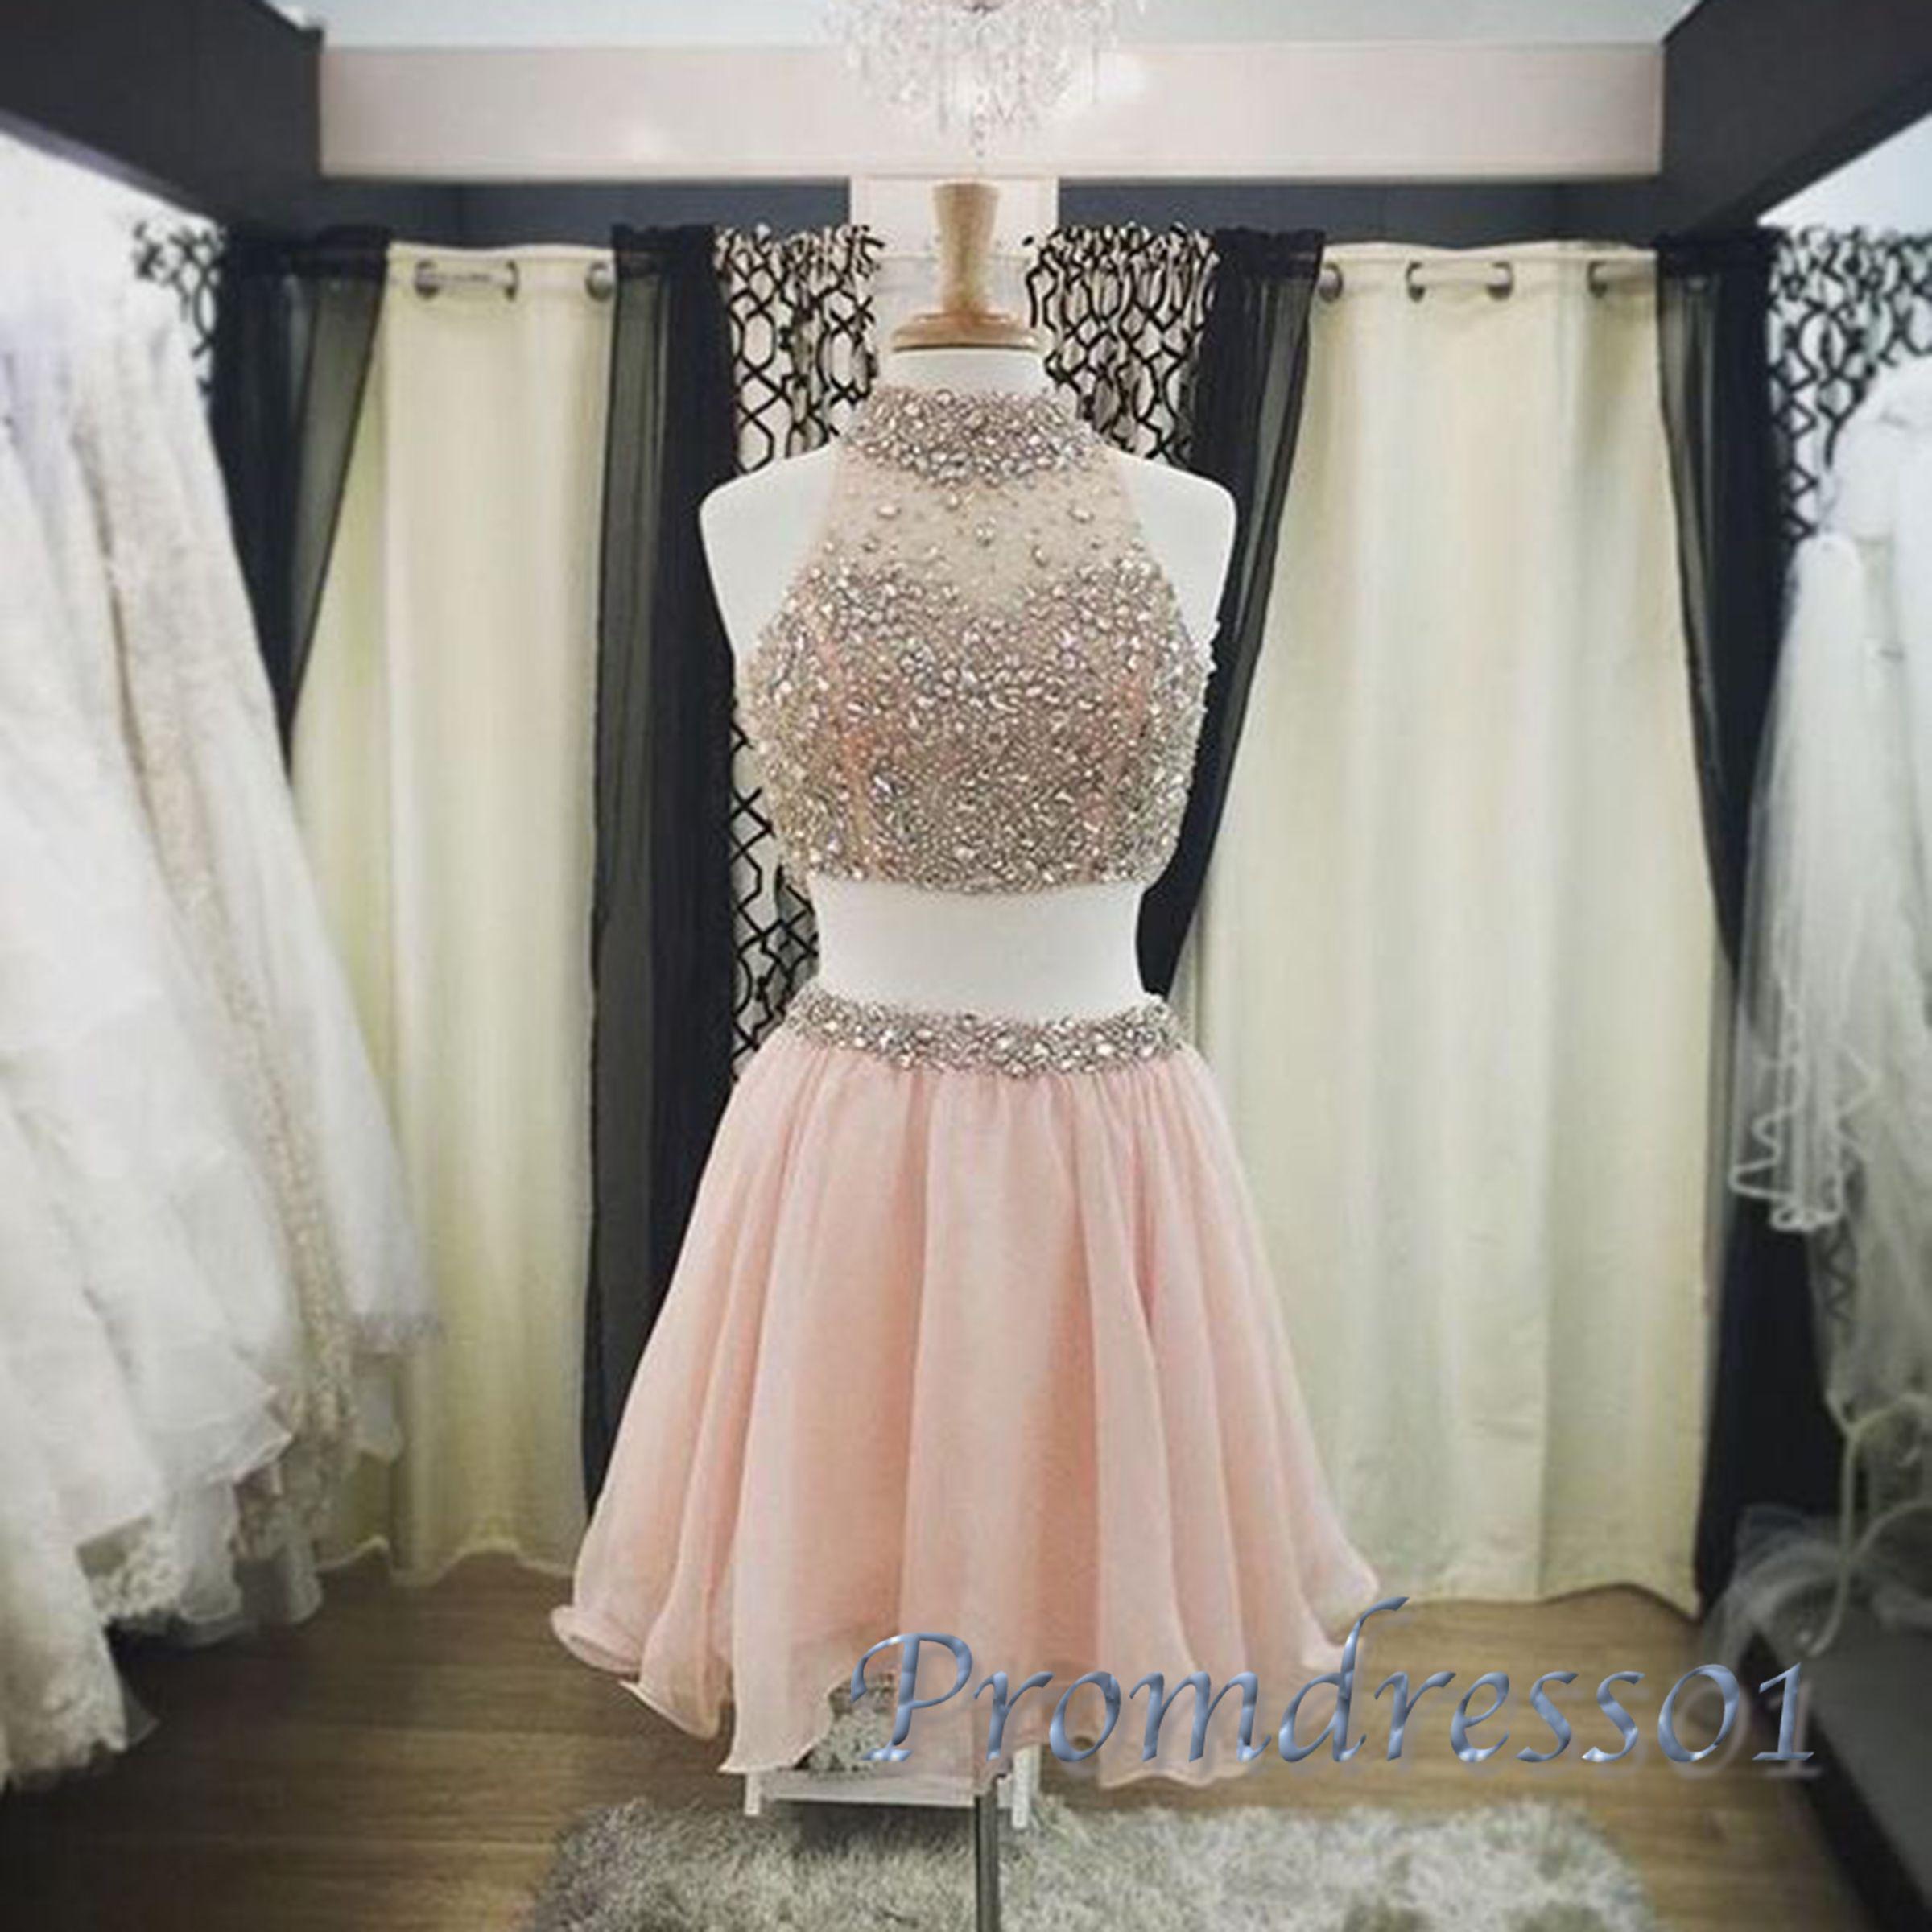 Prom dresses short homecoming dress light orange chiffon two